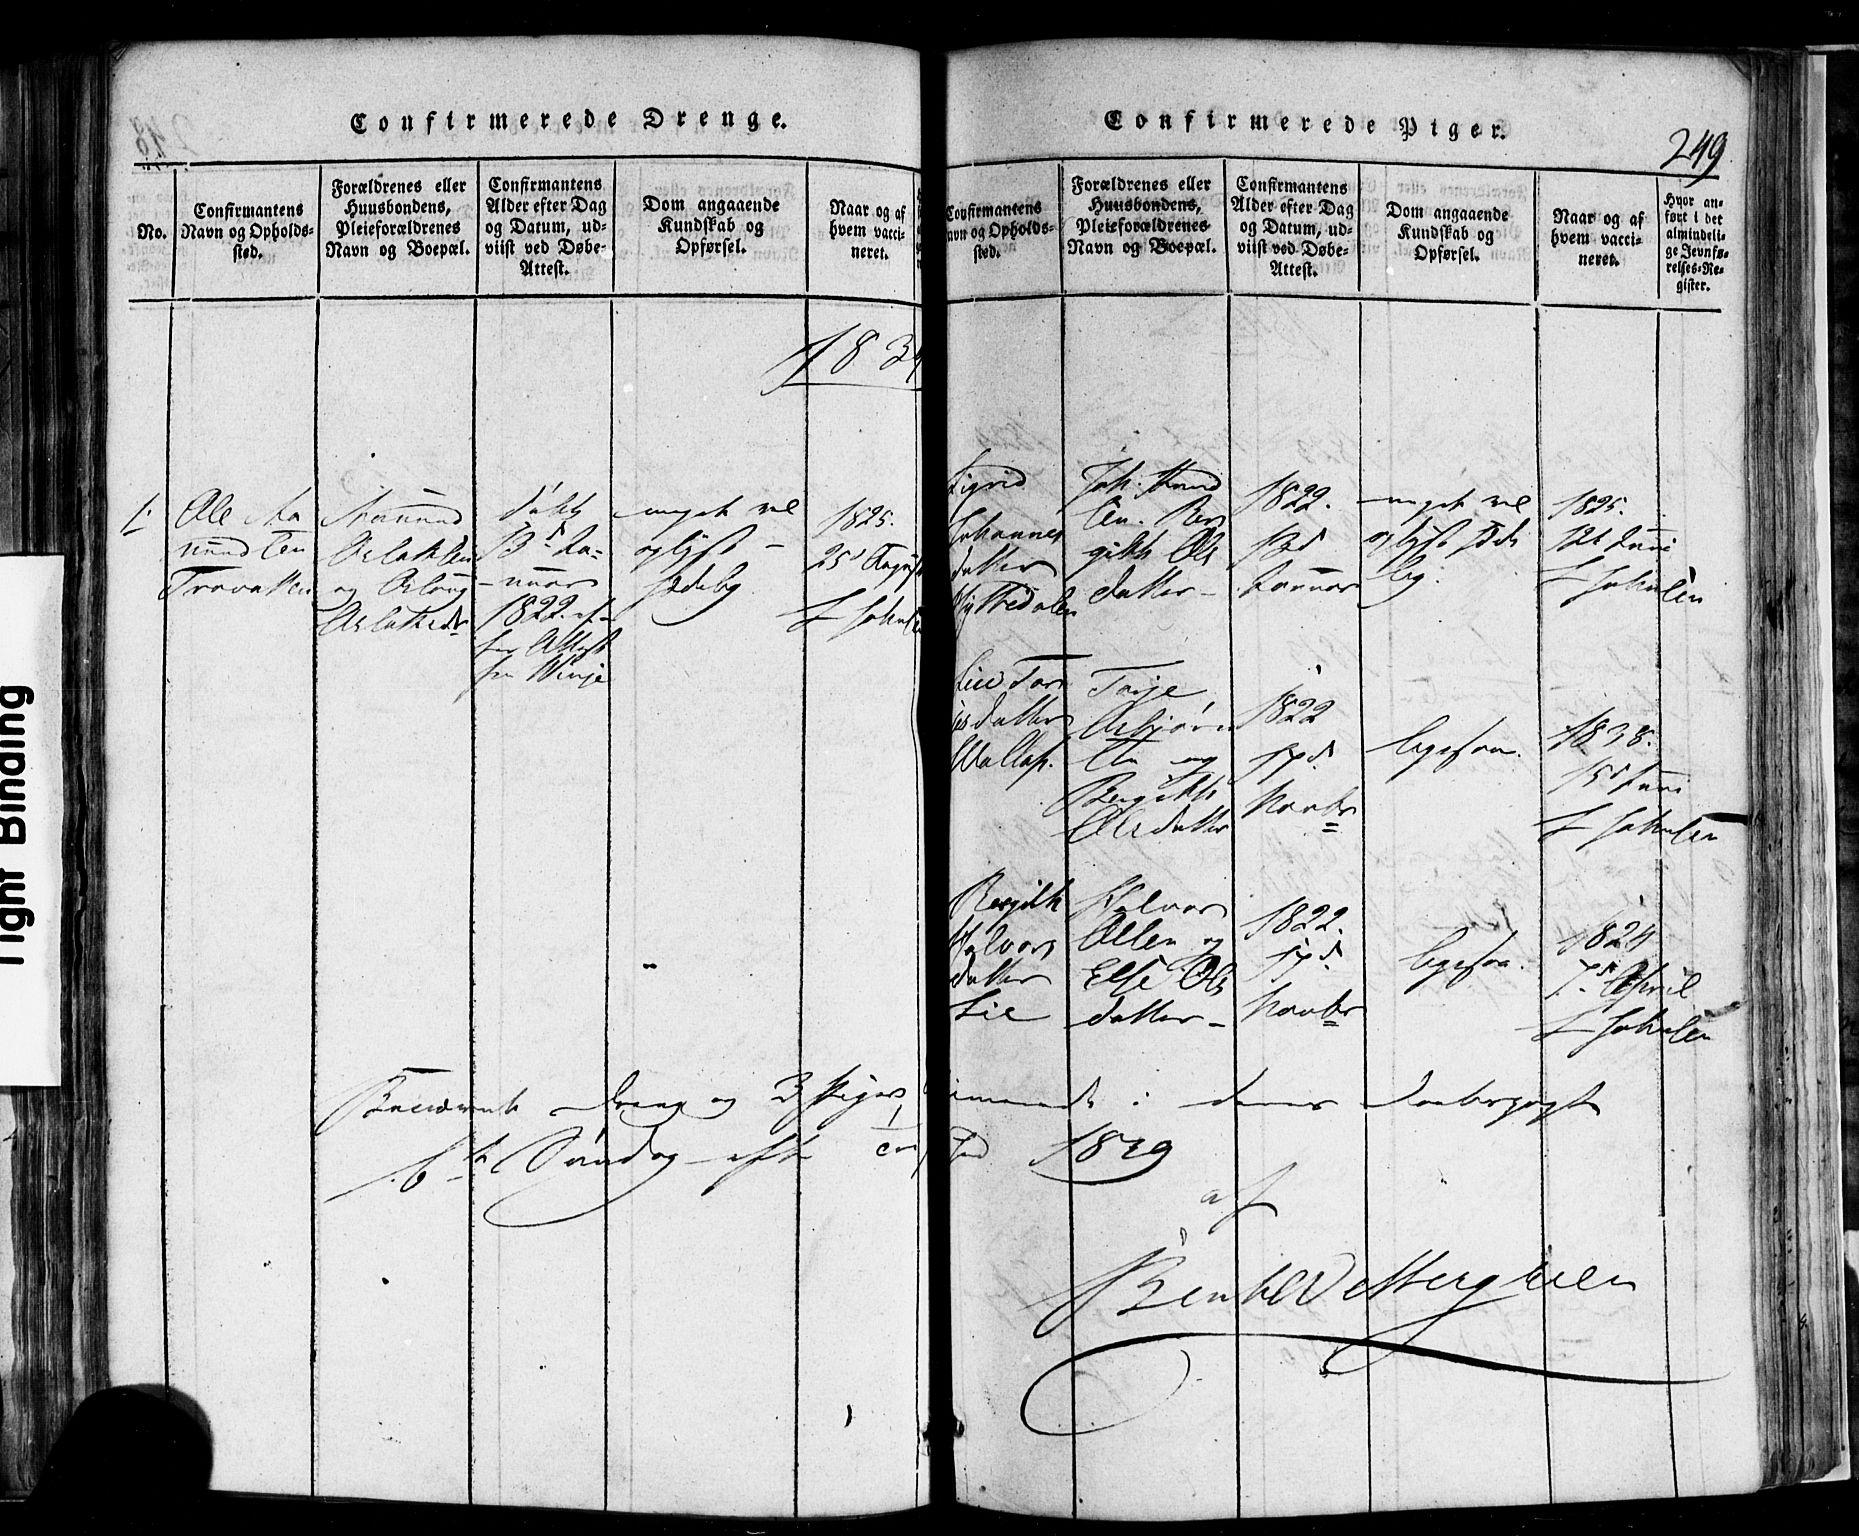 SAKO, Rauland kirkebøker, F/Fa/L0002: Ministerialbok nr. 2, 1815-1860, s. 249